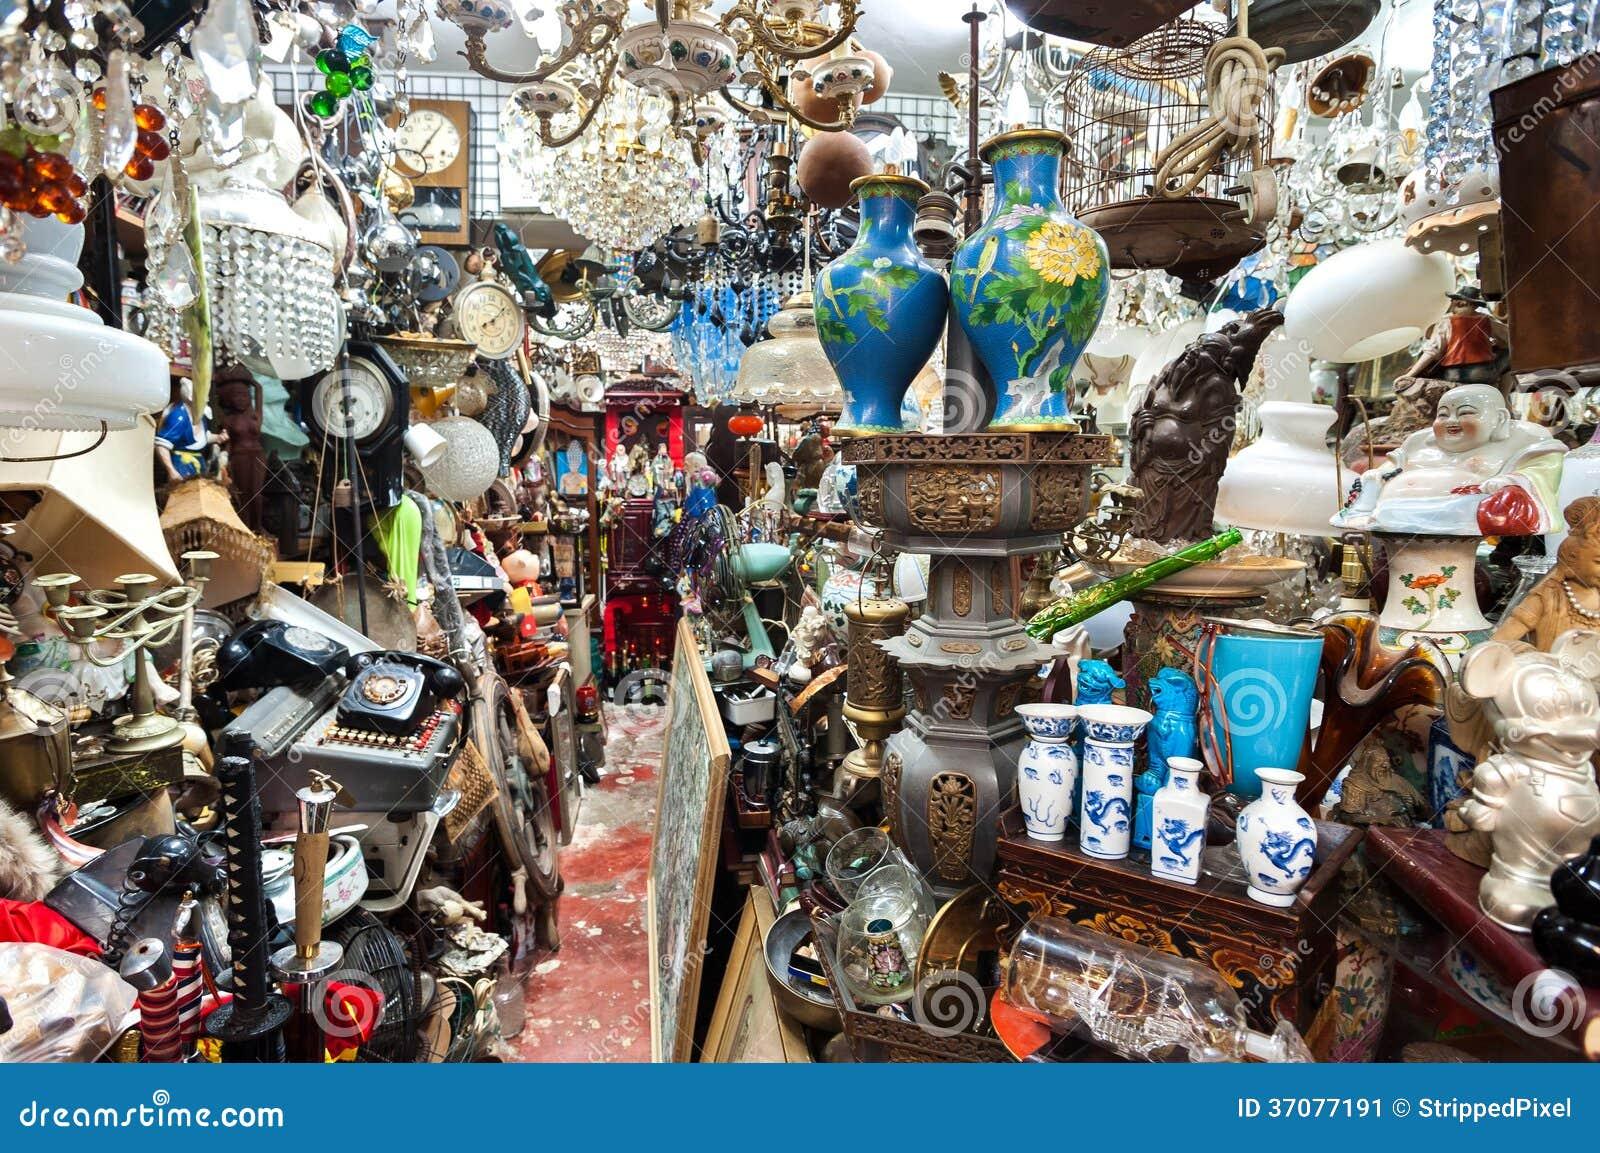 cluttered junk shop at upper lascar row antique market hong kong